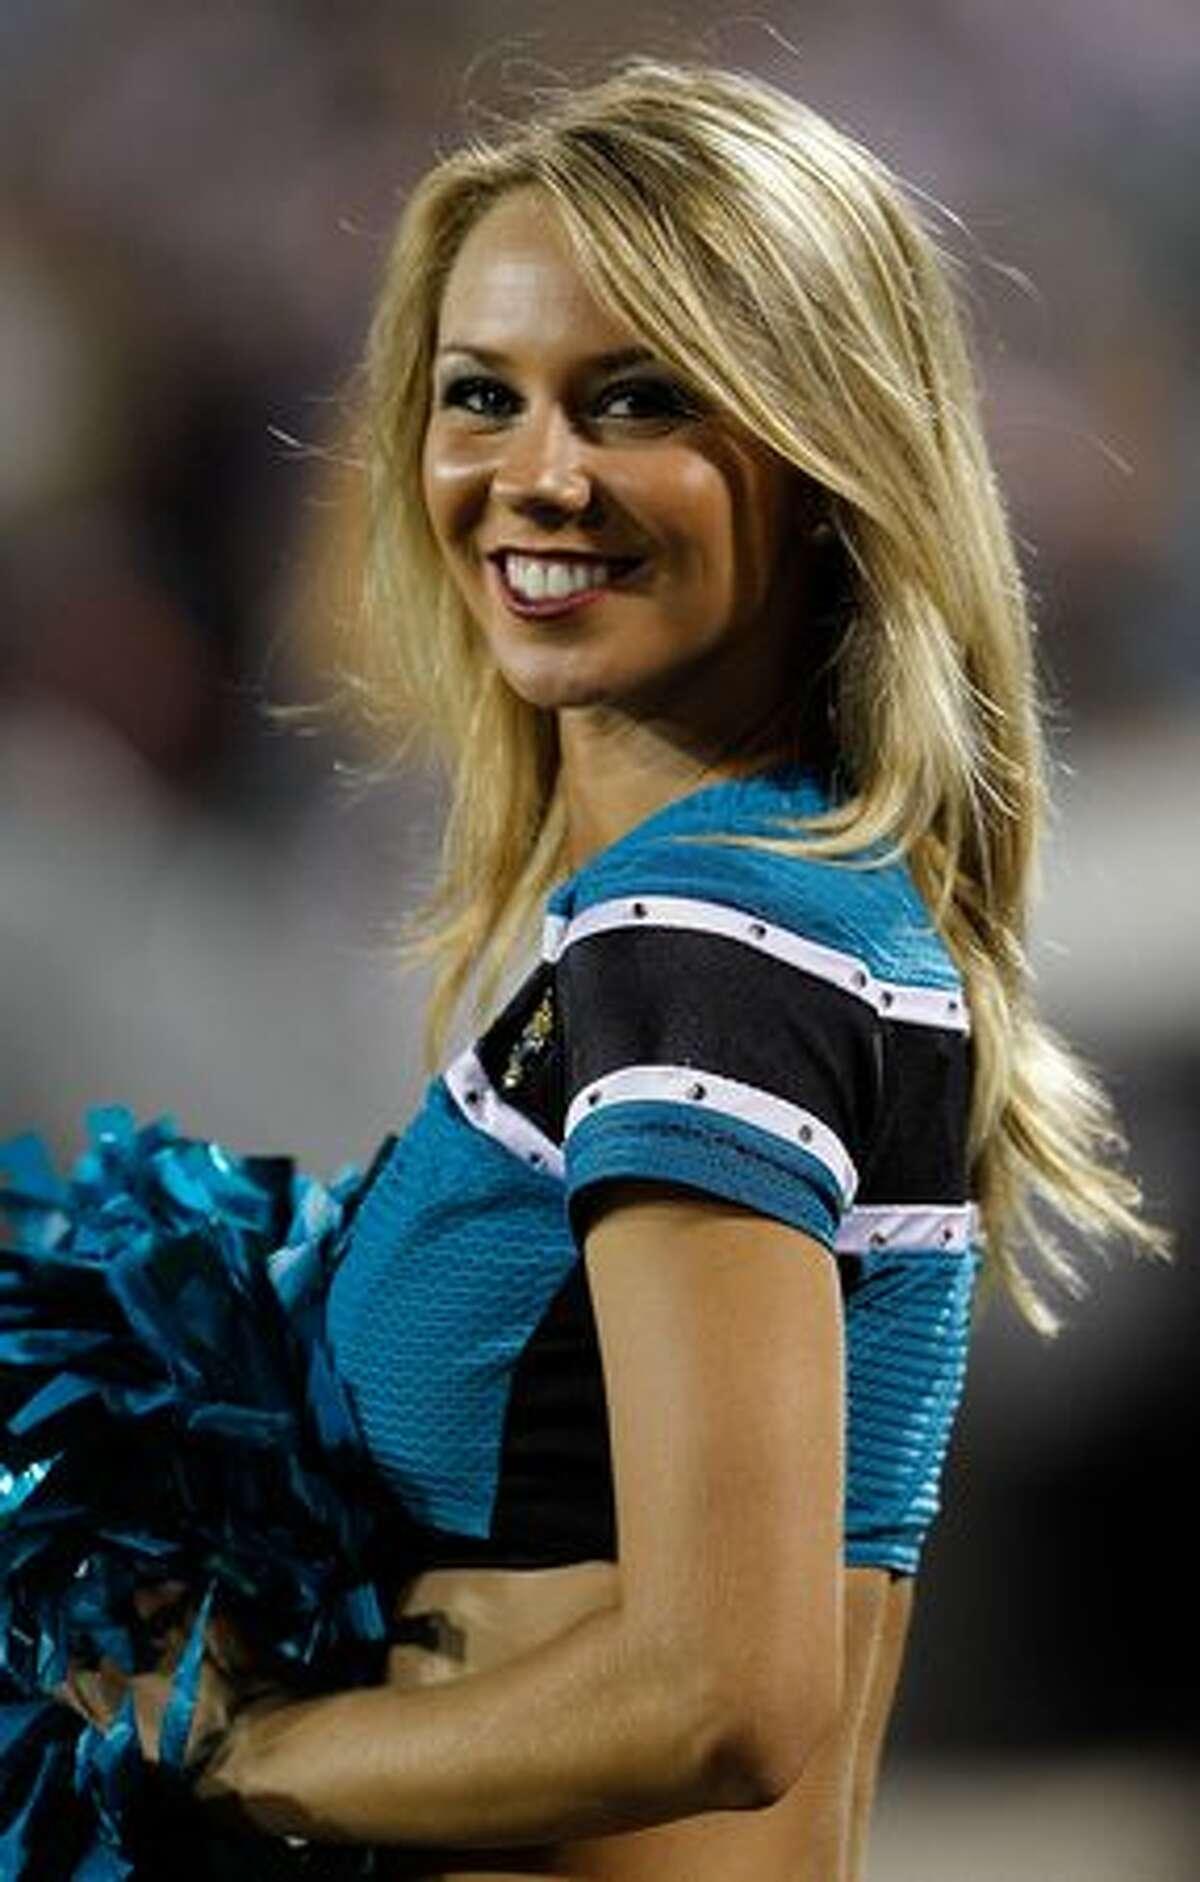 A cheerleader for the Jacksonville Jaguars.